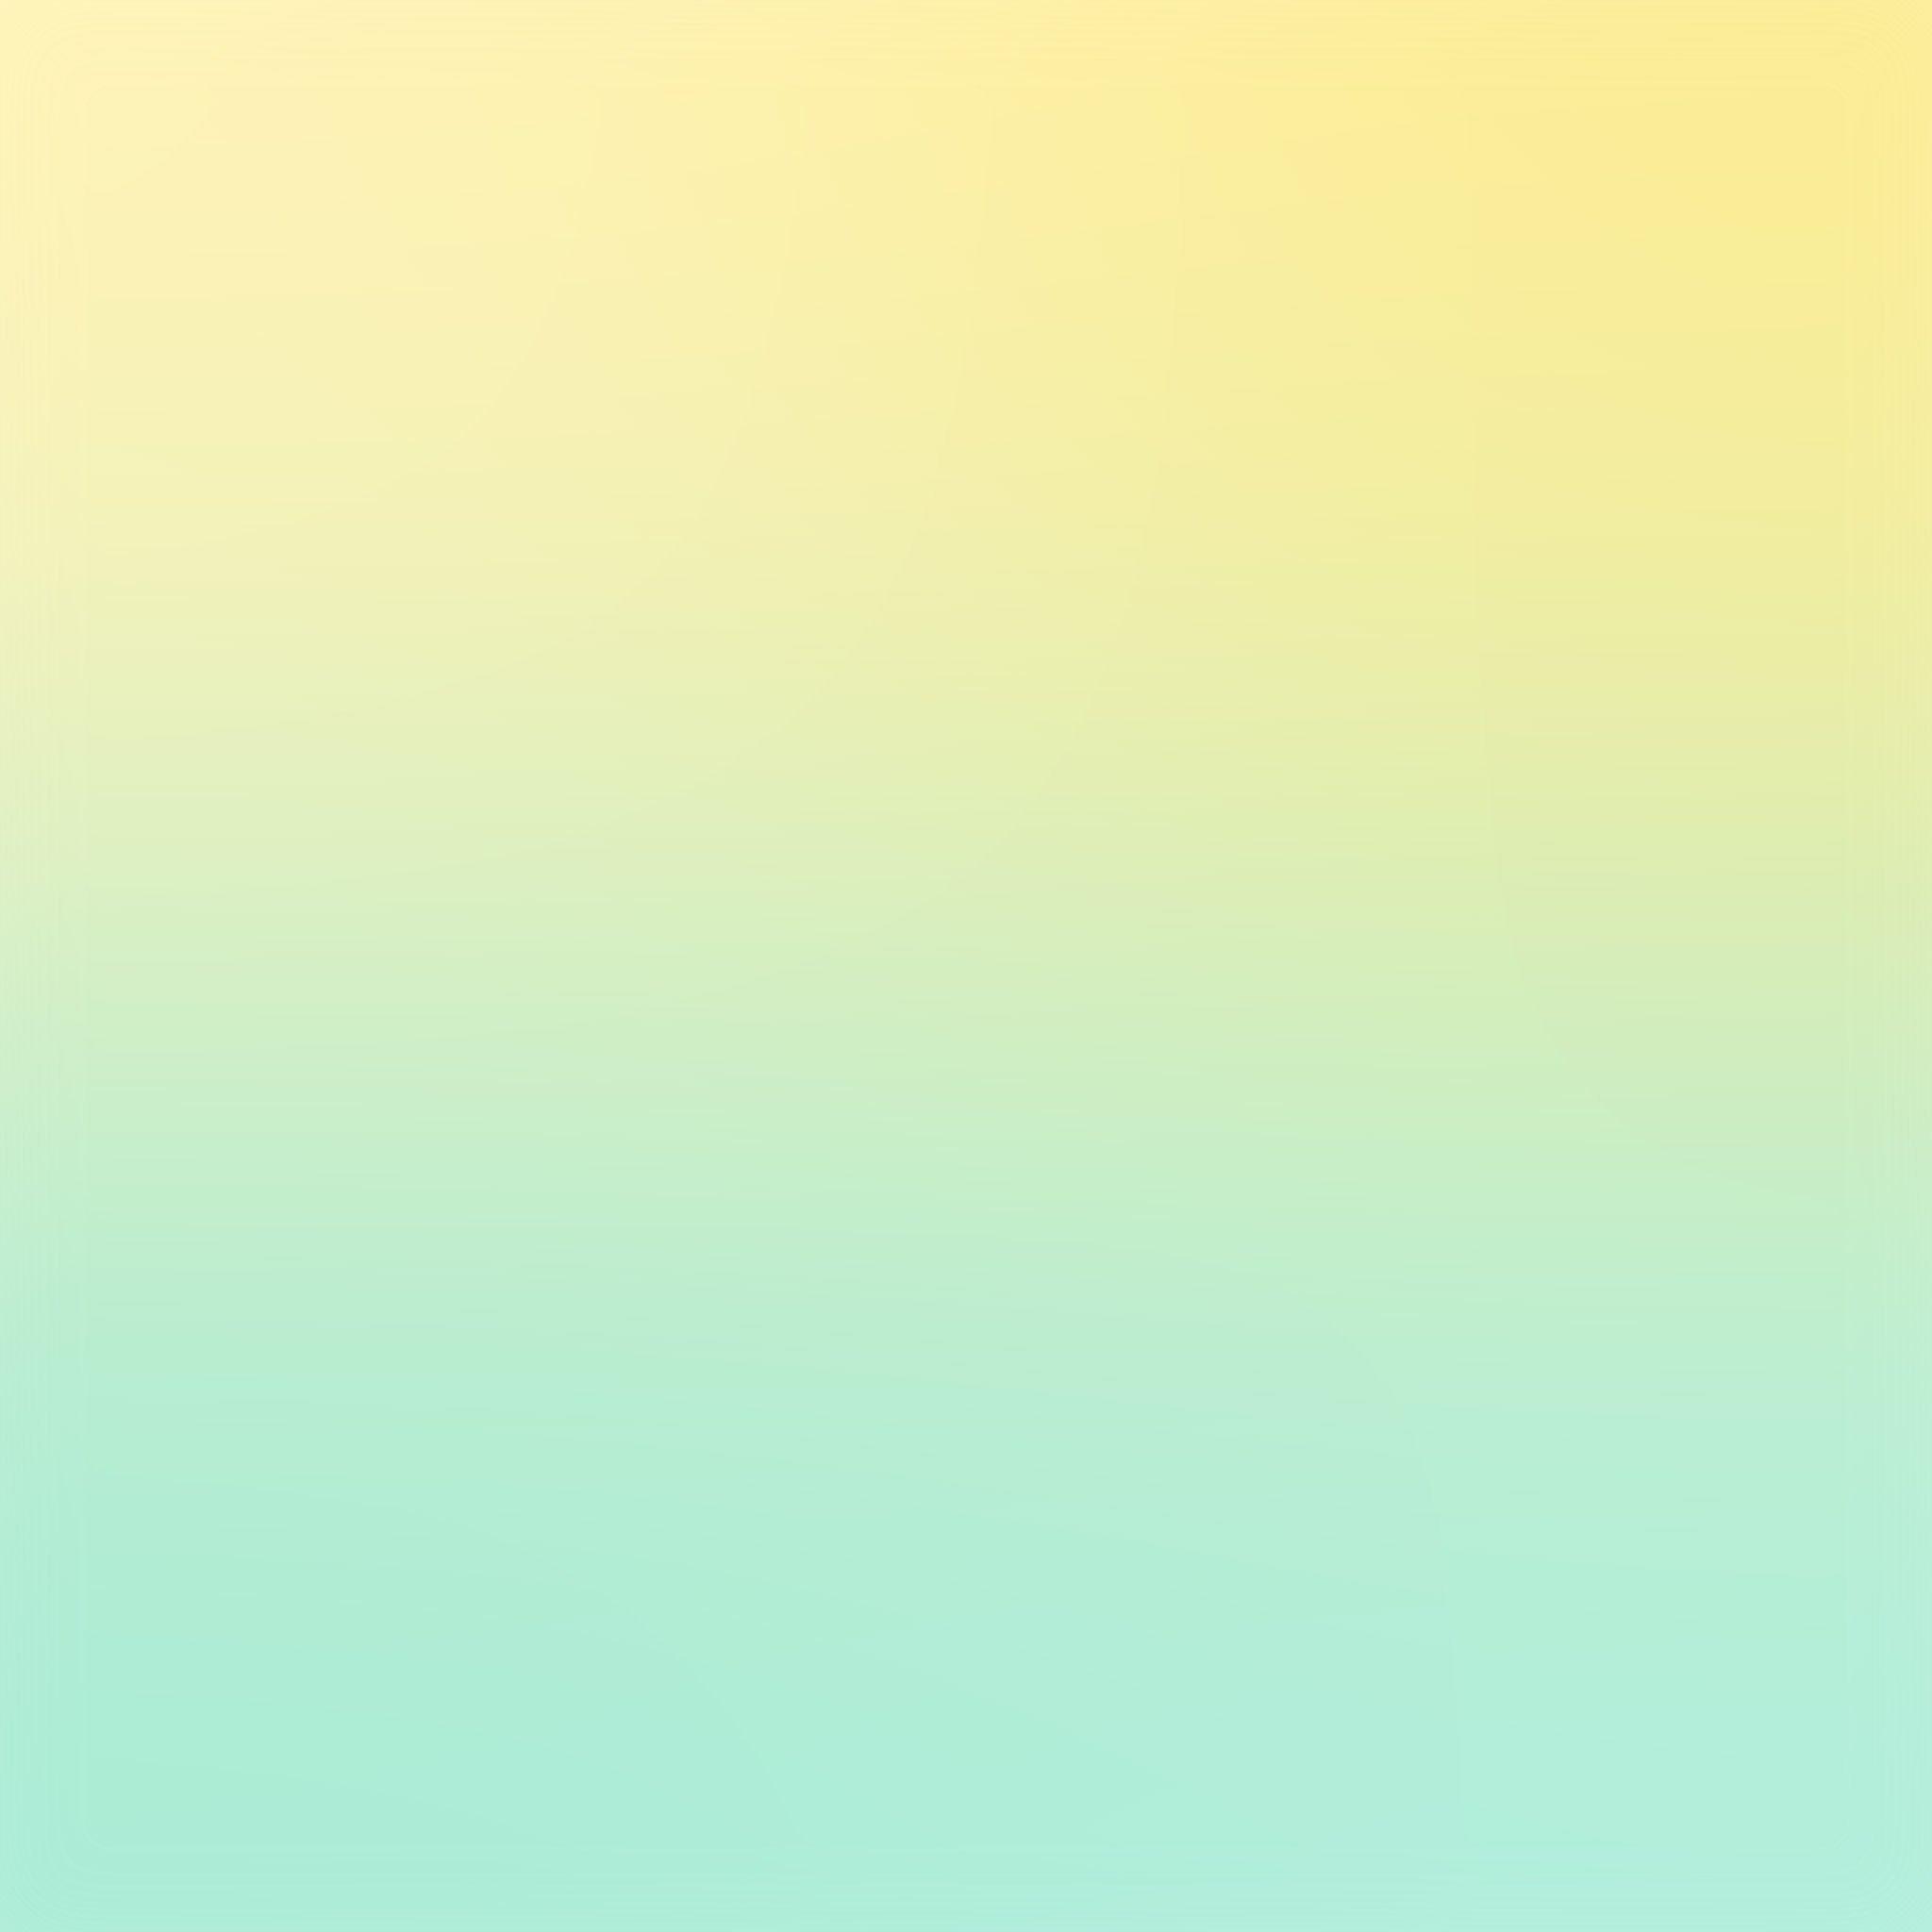 Yellow Green Pastel Blur Gradation Ipad Air Wallpapers Free